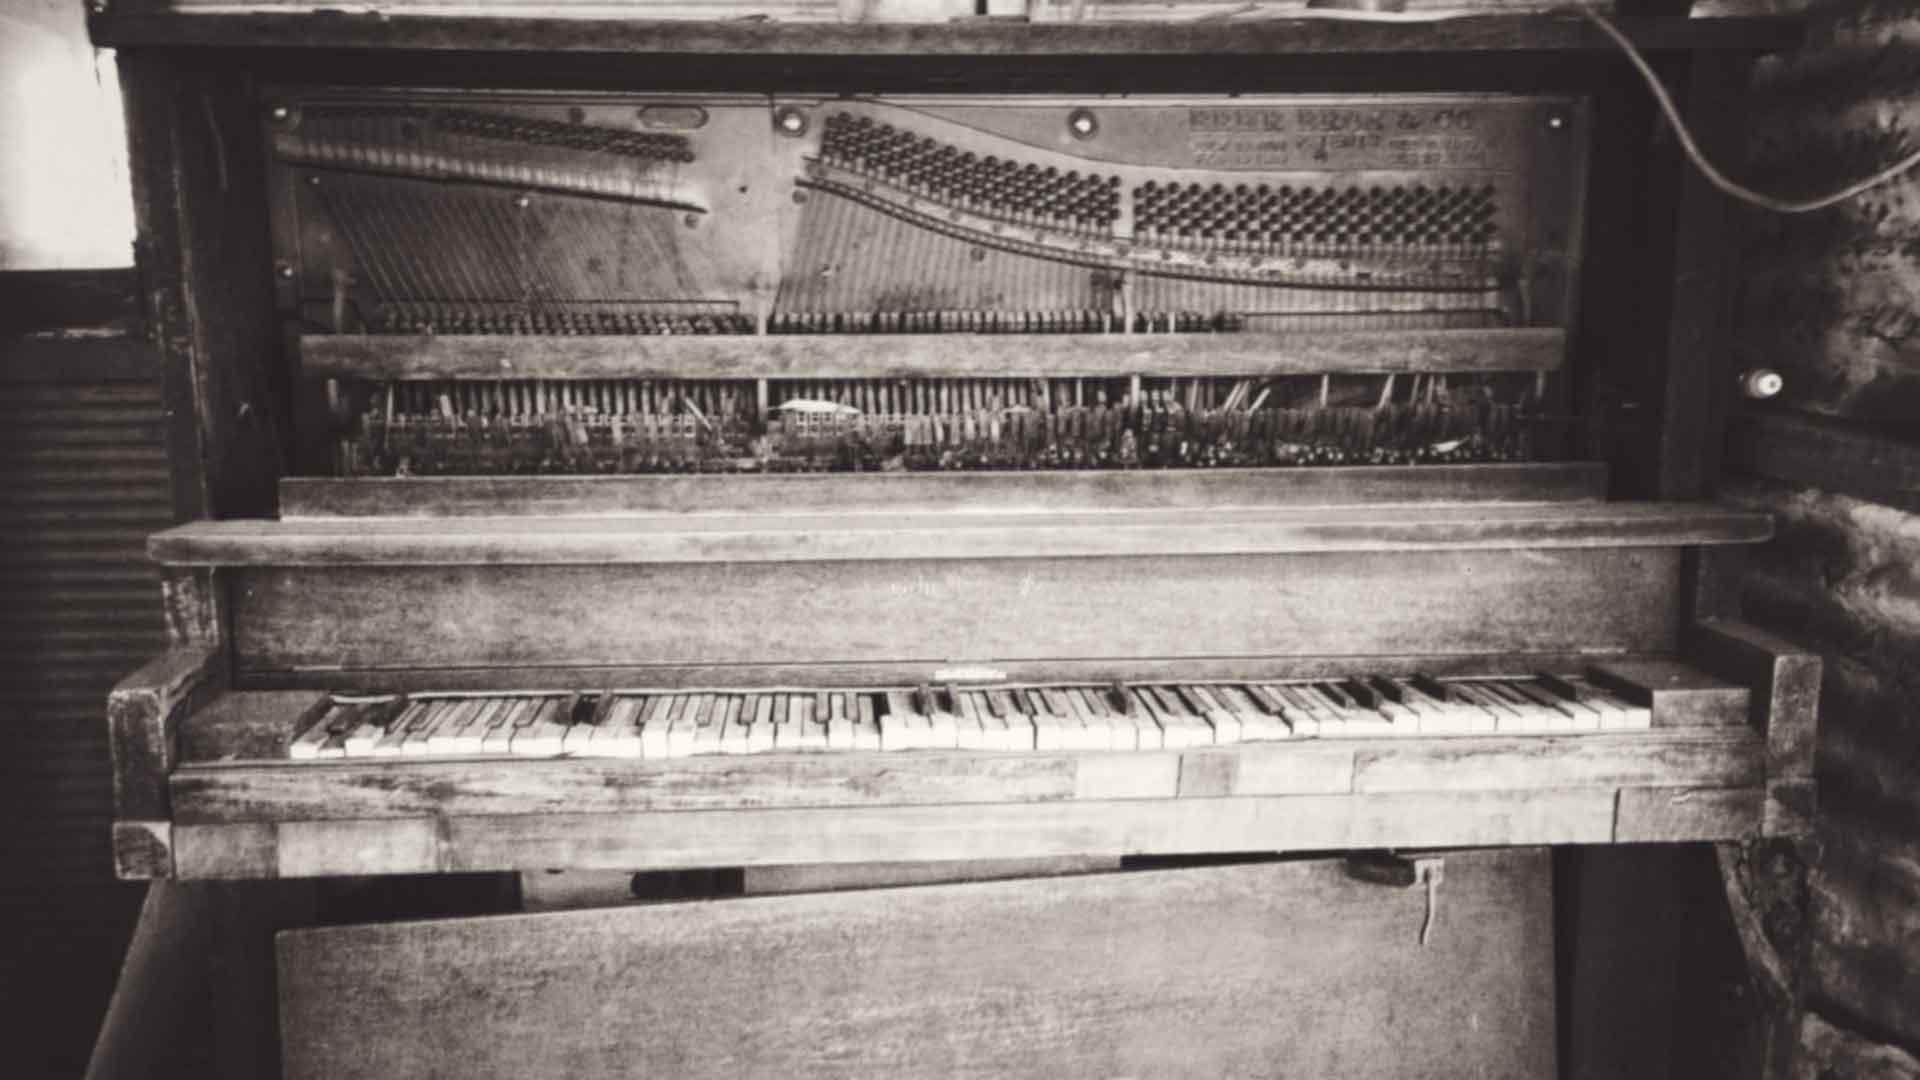 vintage piano background